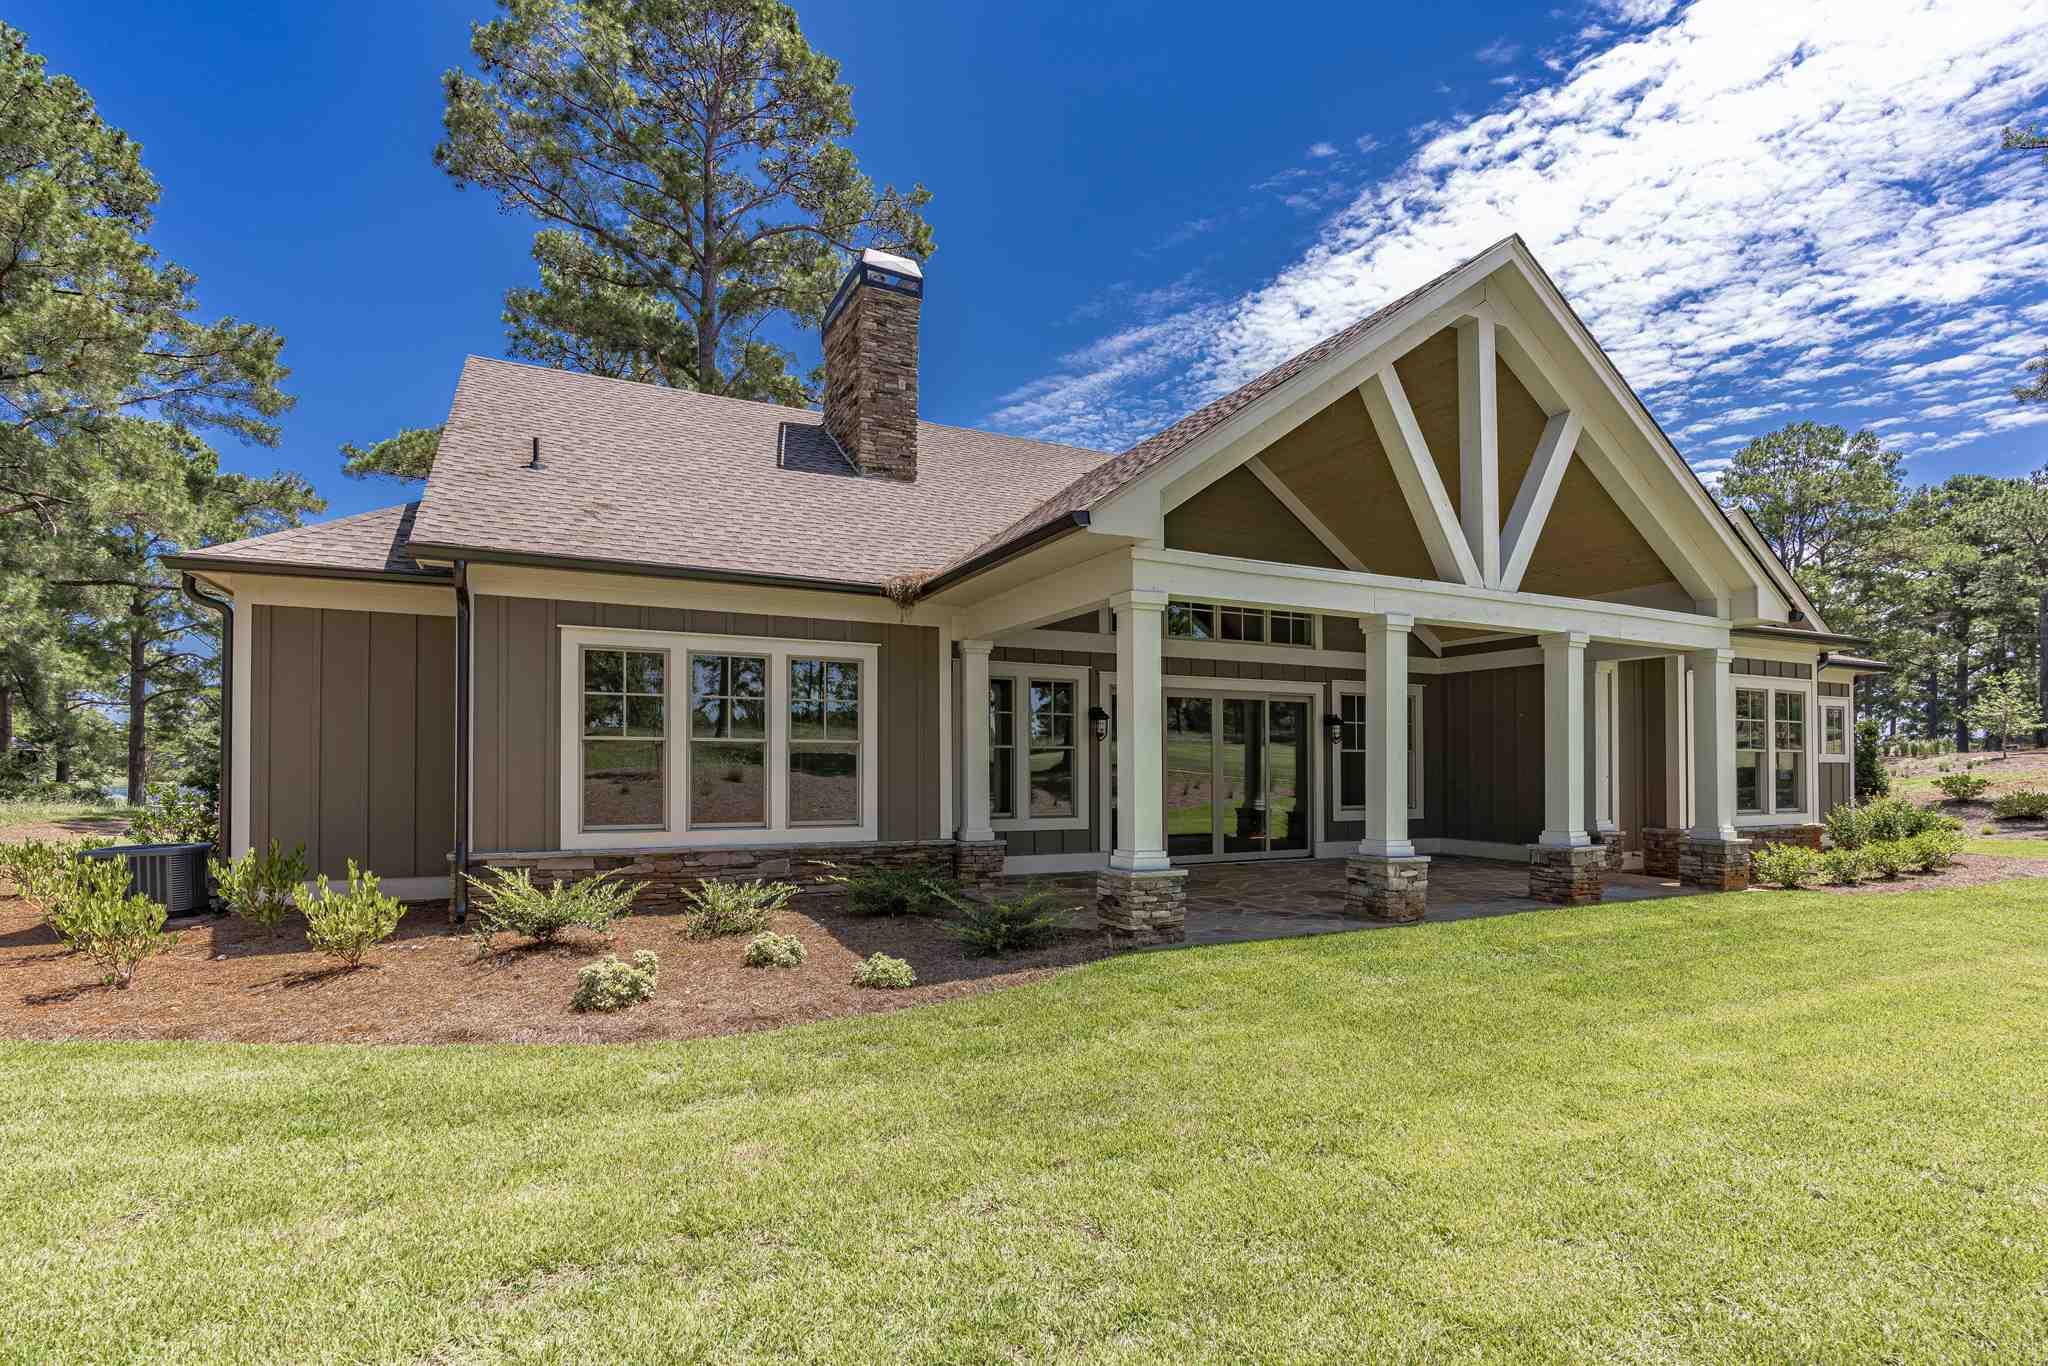 155 IRON HORSE DRIVE, Lake Oconee in Putnam County, GA 31024 Home for Sale